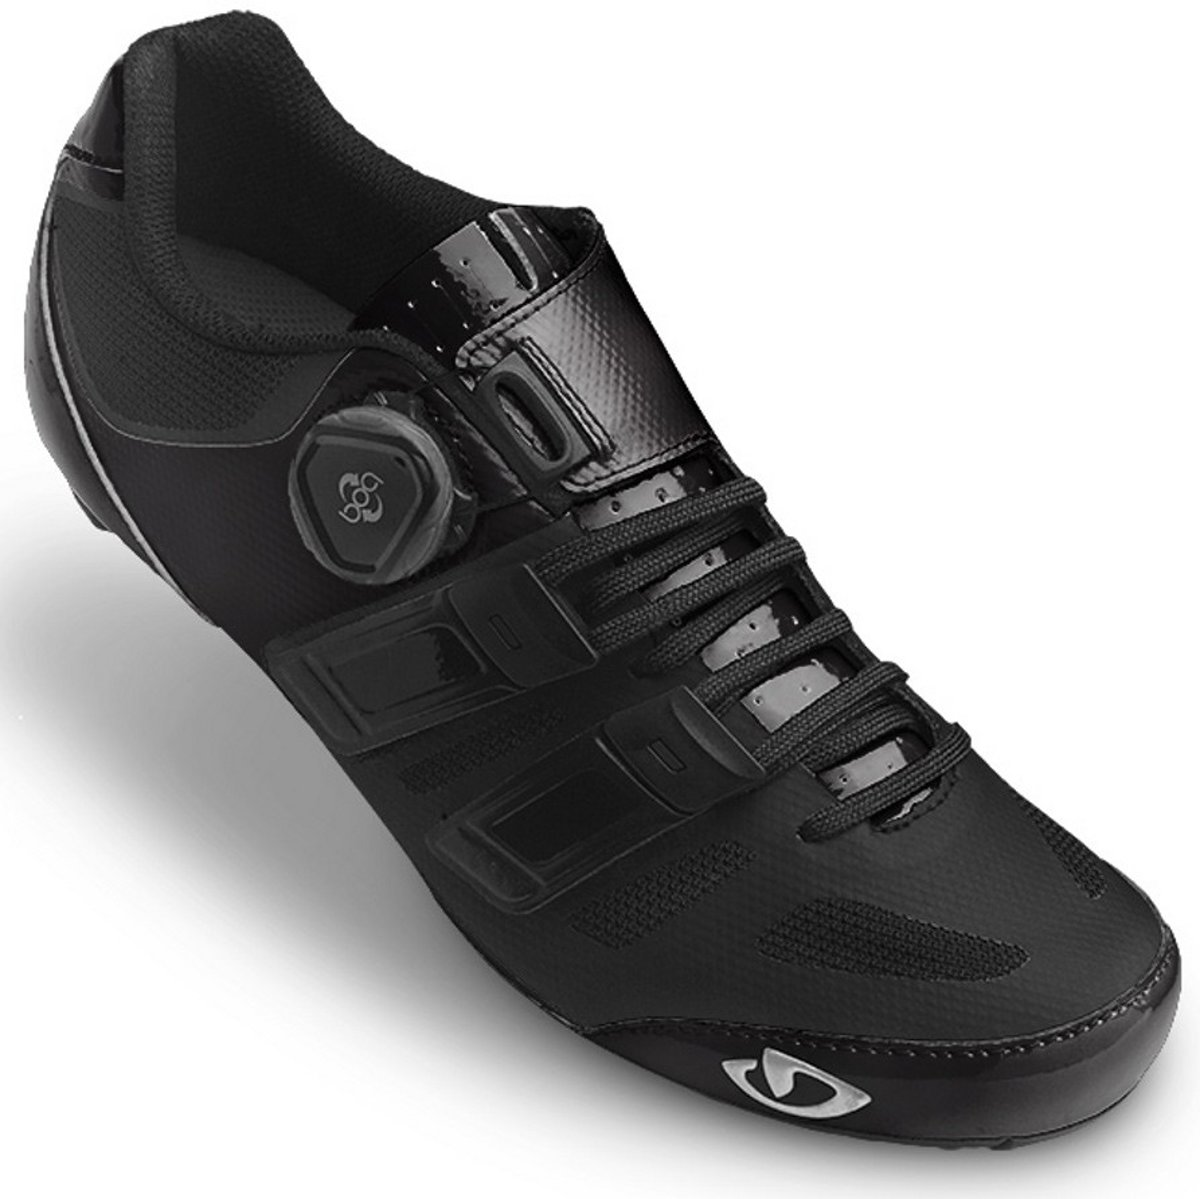 Giro Raes Techlace Schoenen Dames, black Schoenmaat EU 37